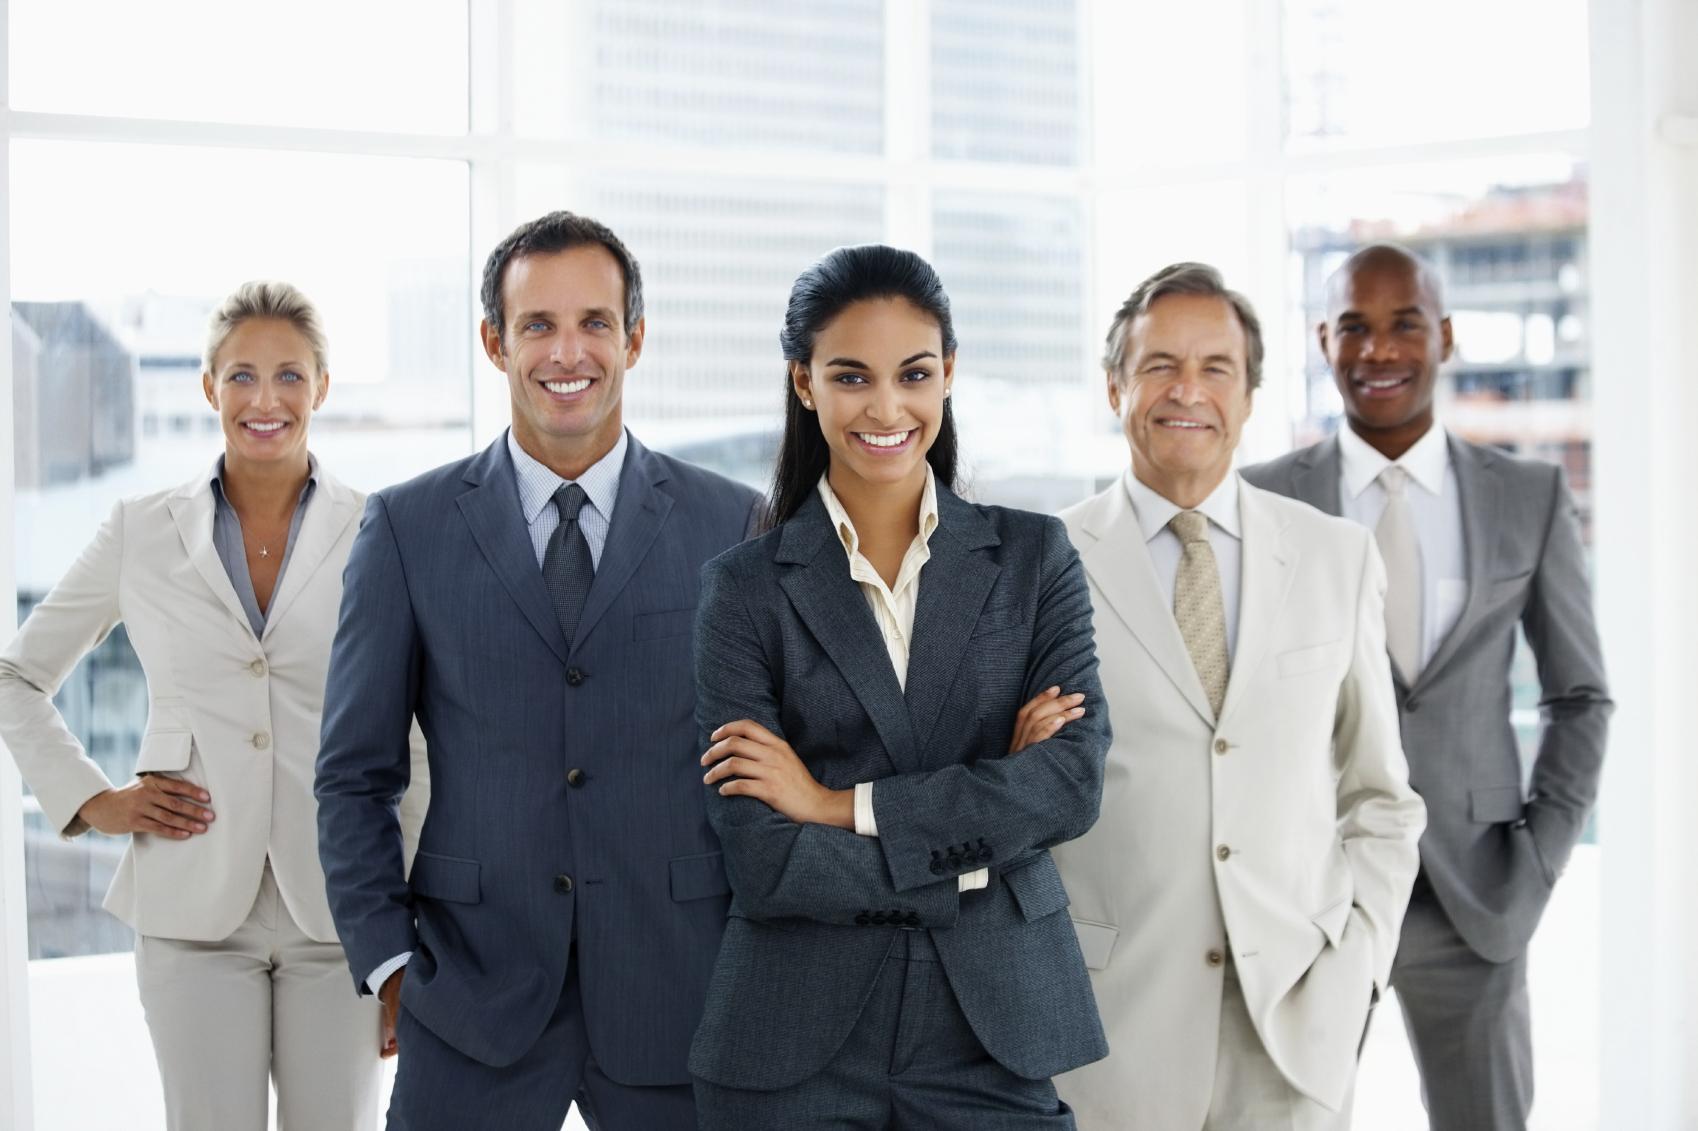 https://www.ekaenlinea.com/wp-content/uploads/2014/02/executive-hr-jobs.jpg